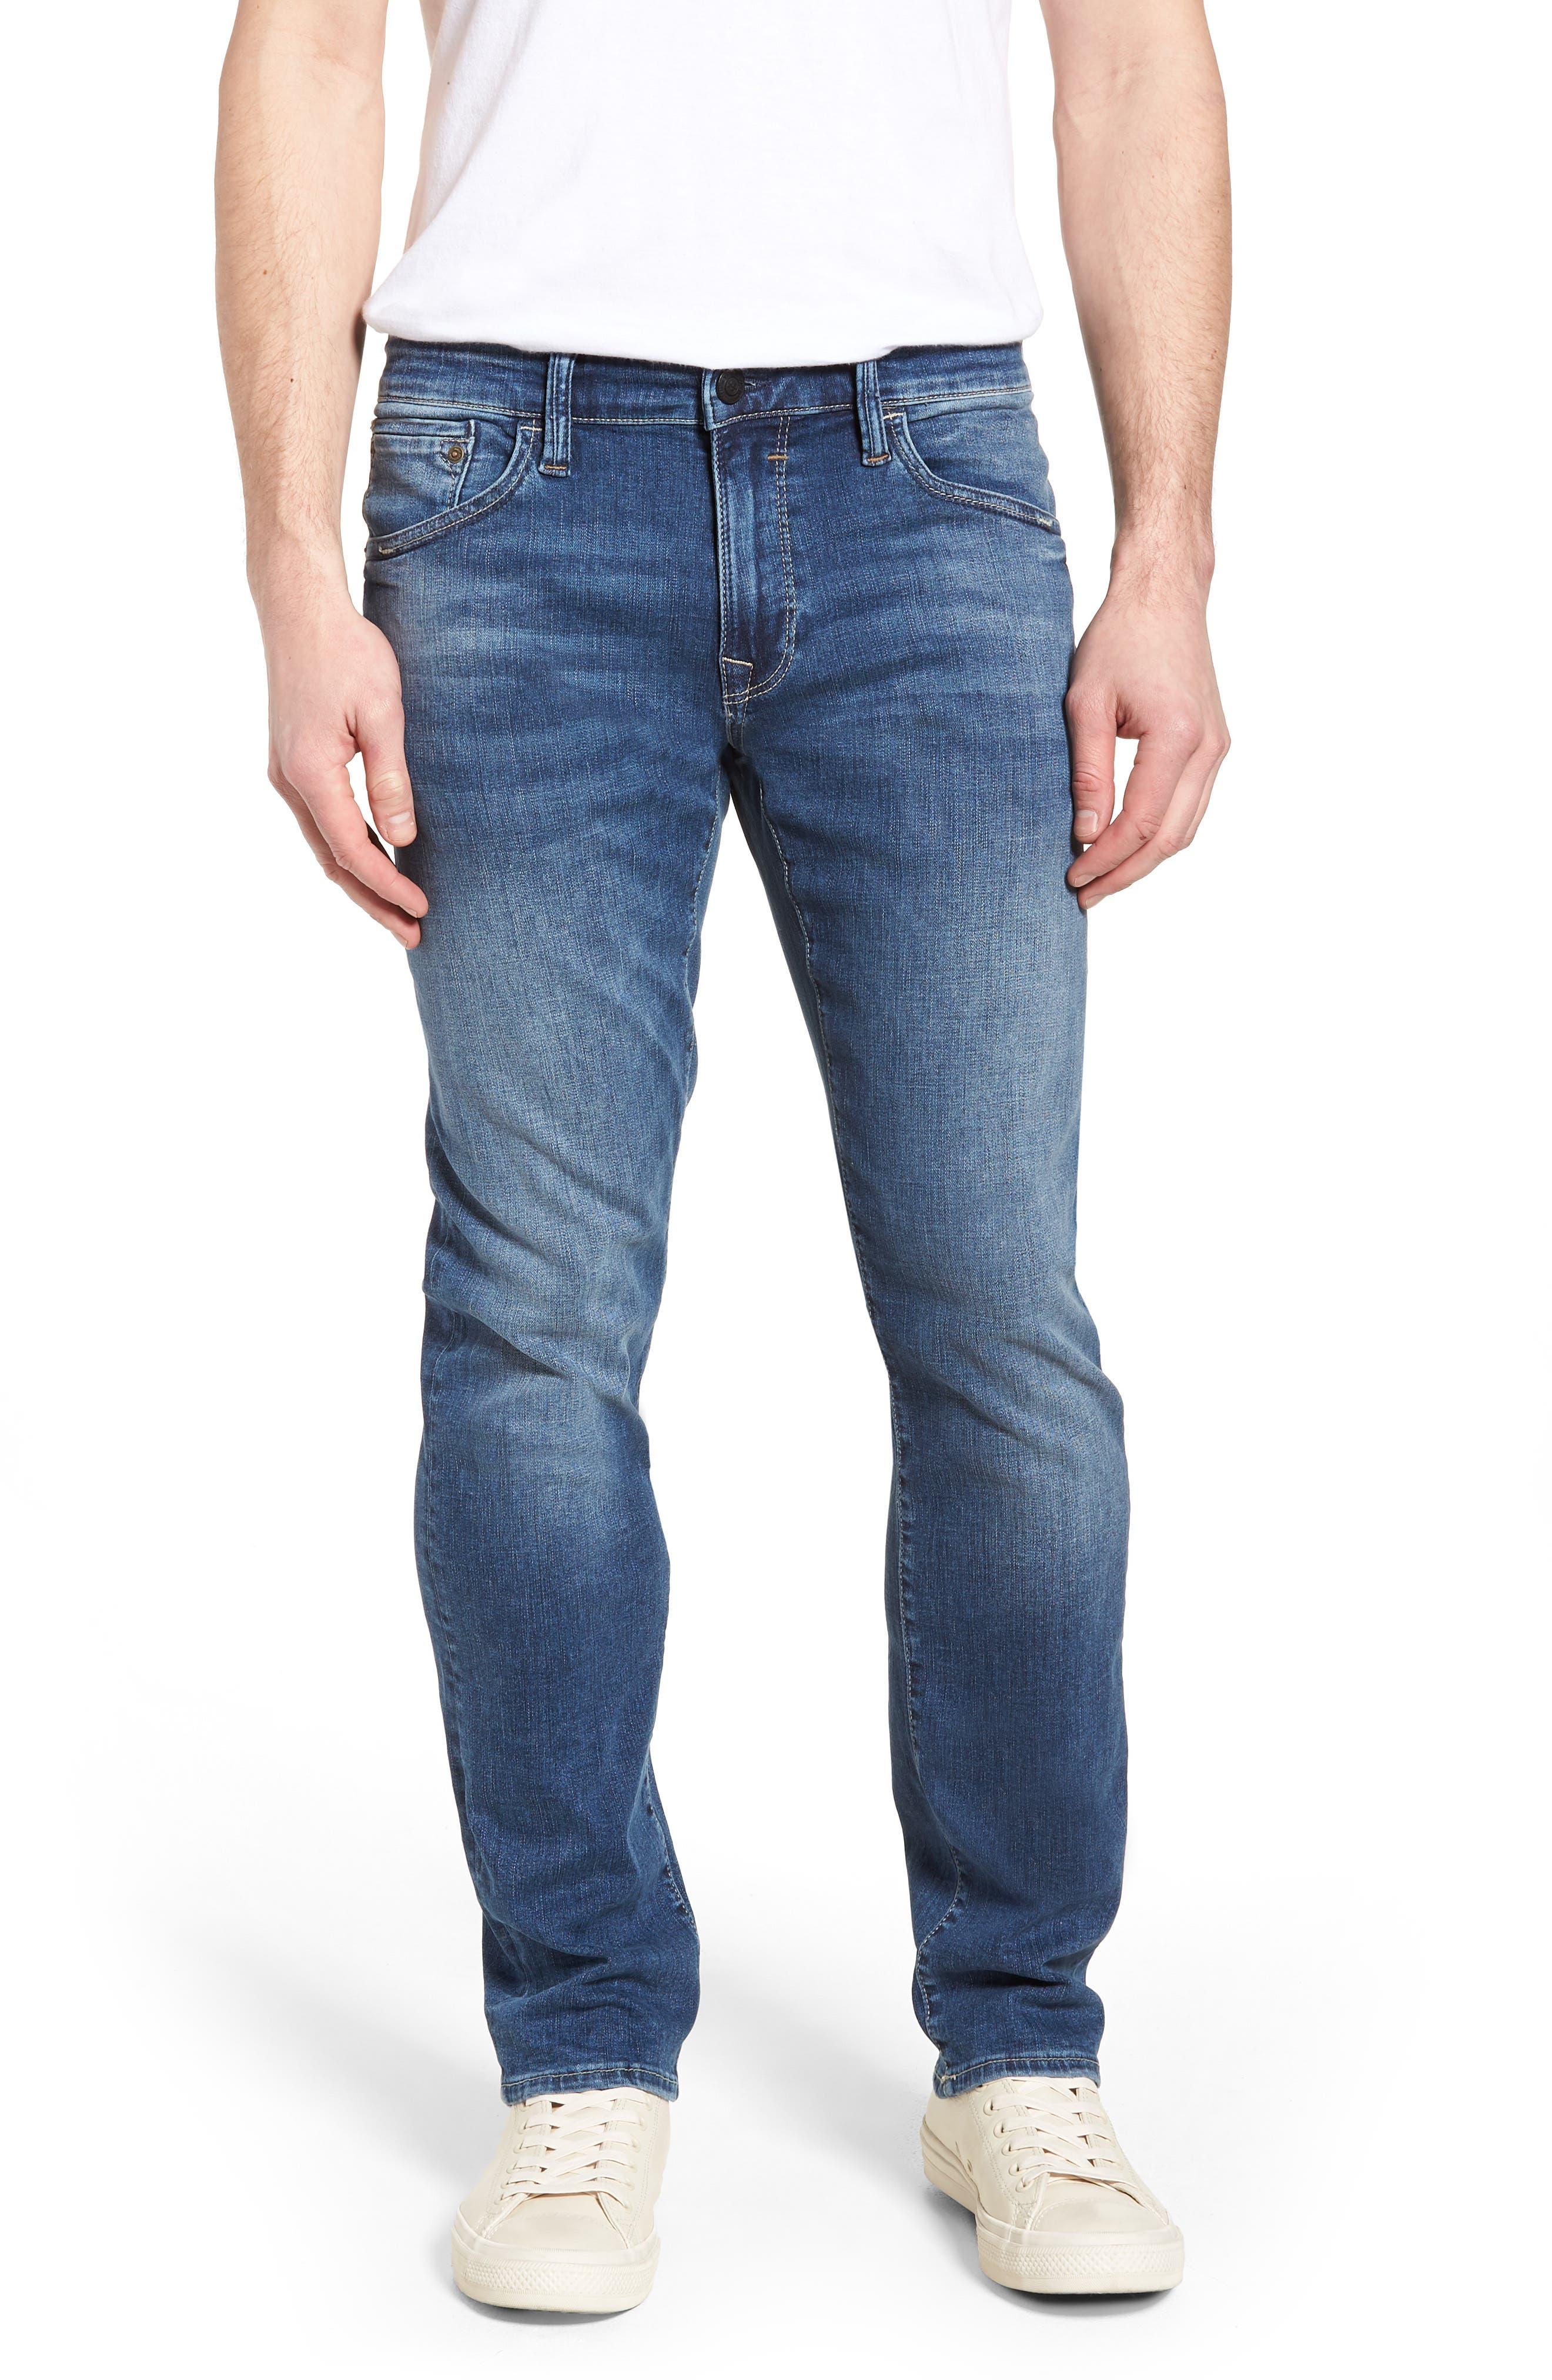 Zach Straight Leg Jeans,                         Main,                         color, Indigo Cashmere